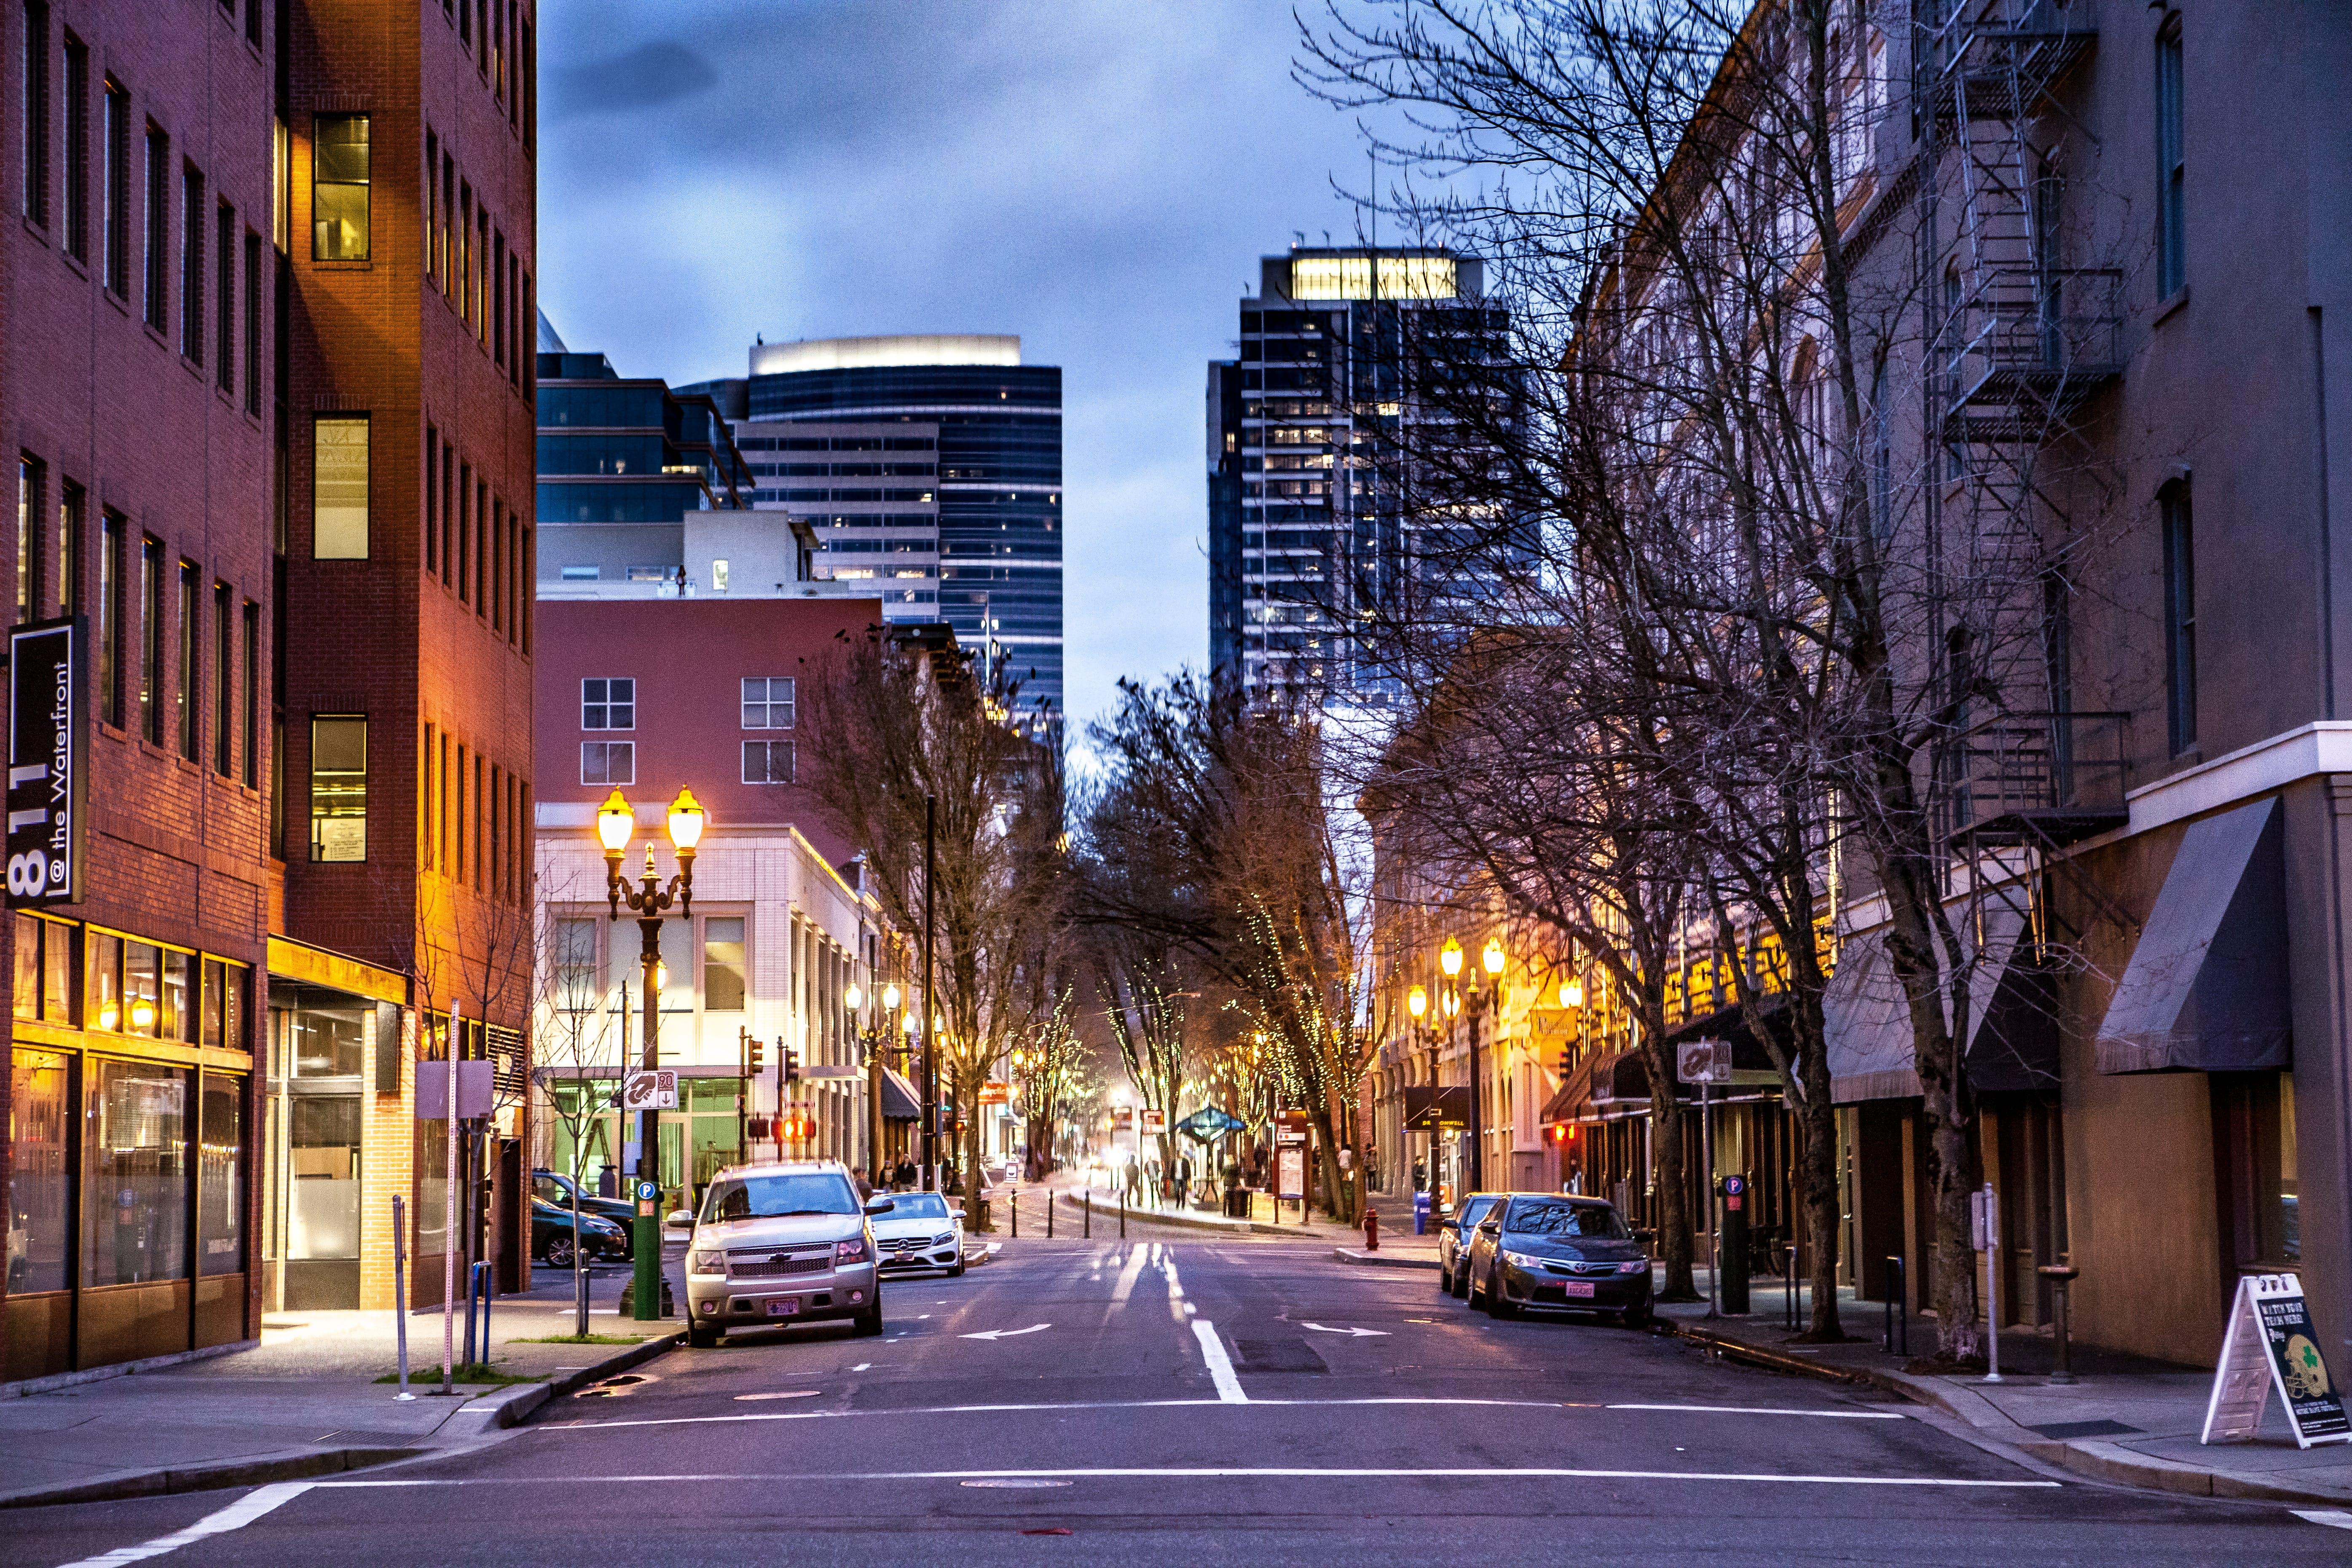 Free stock photo of Portland